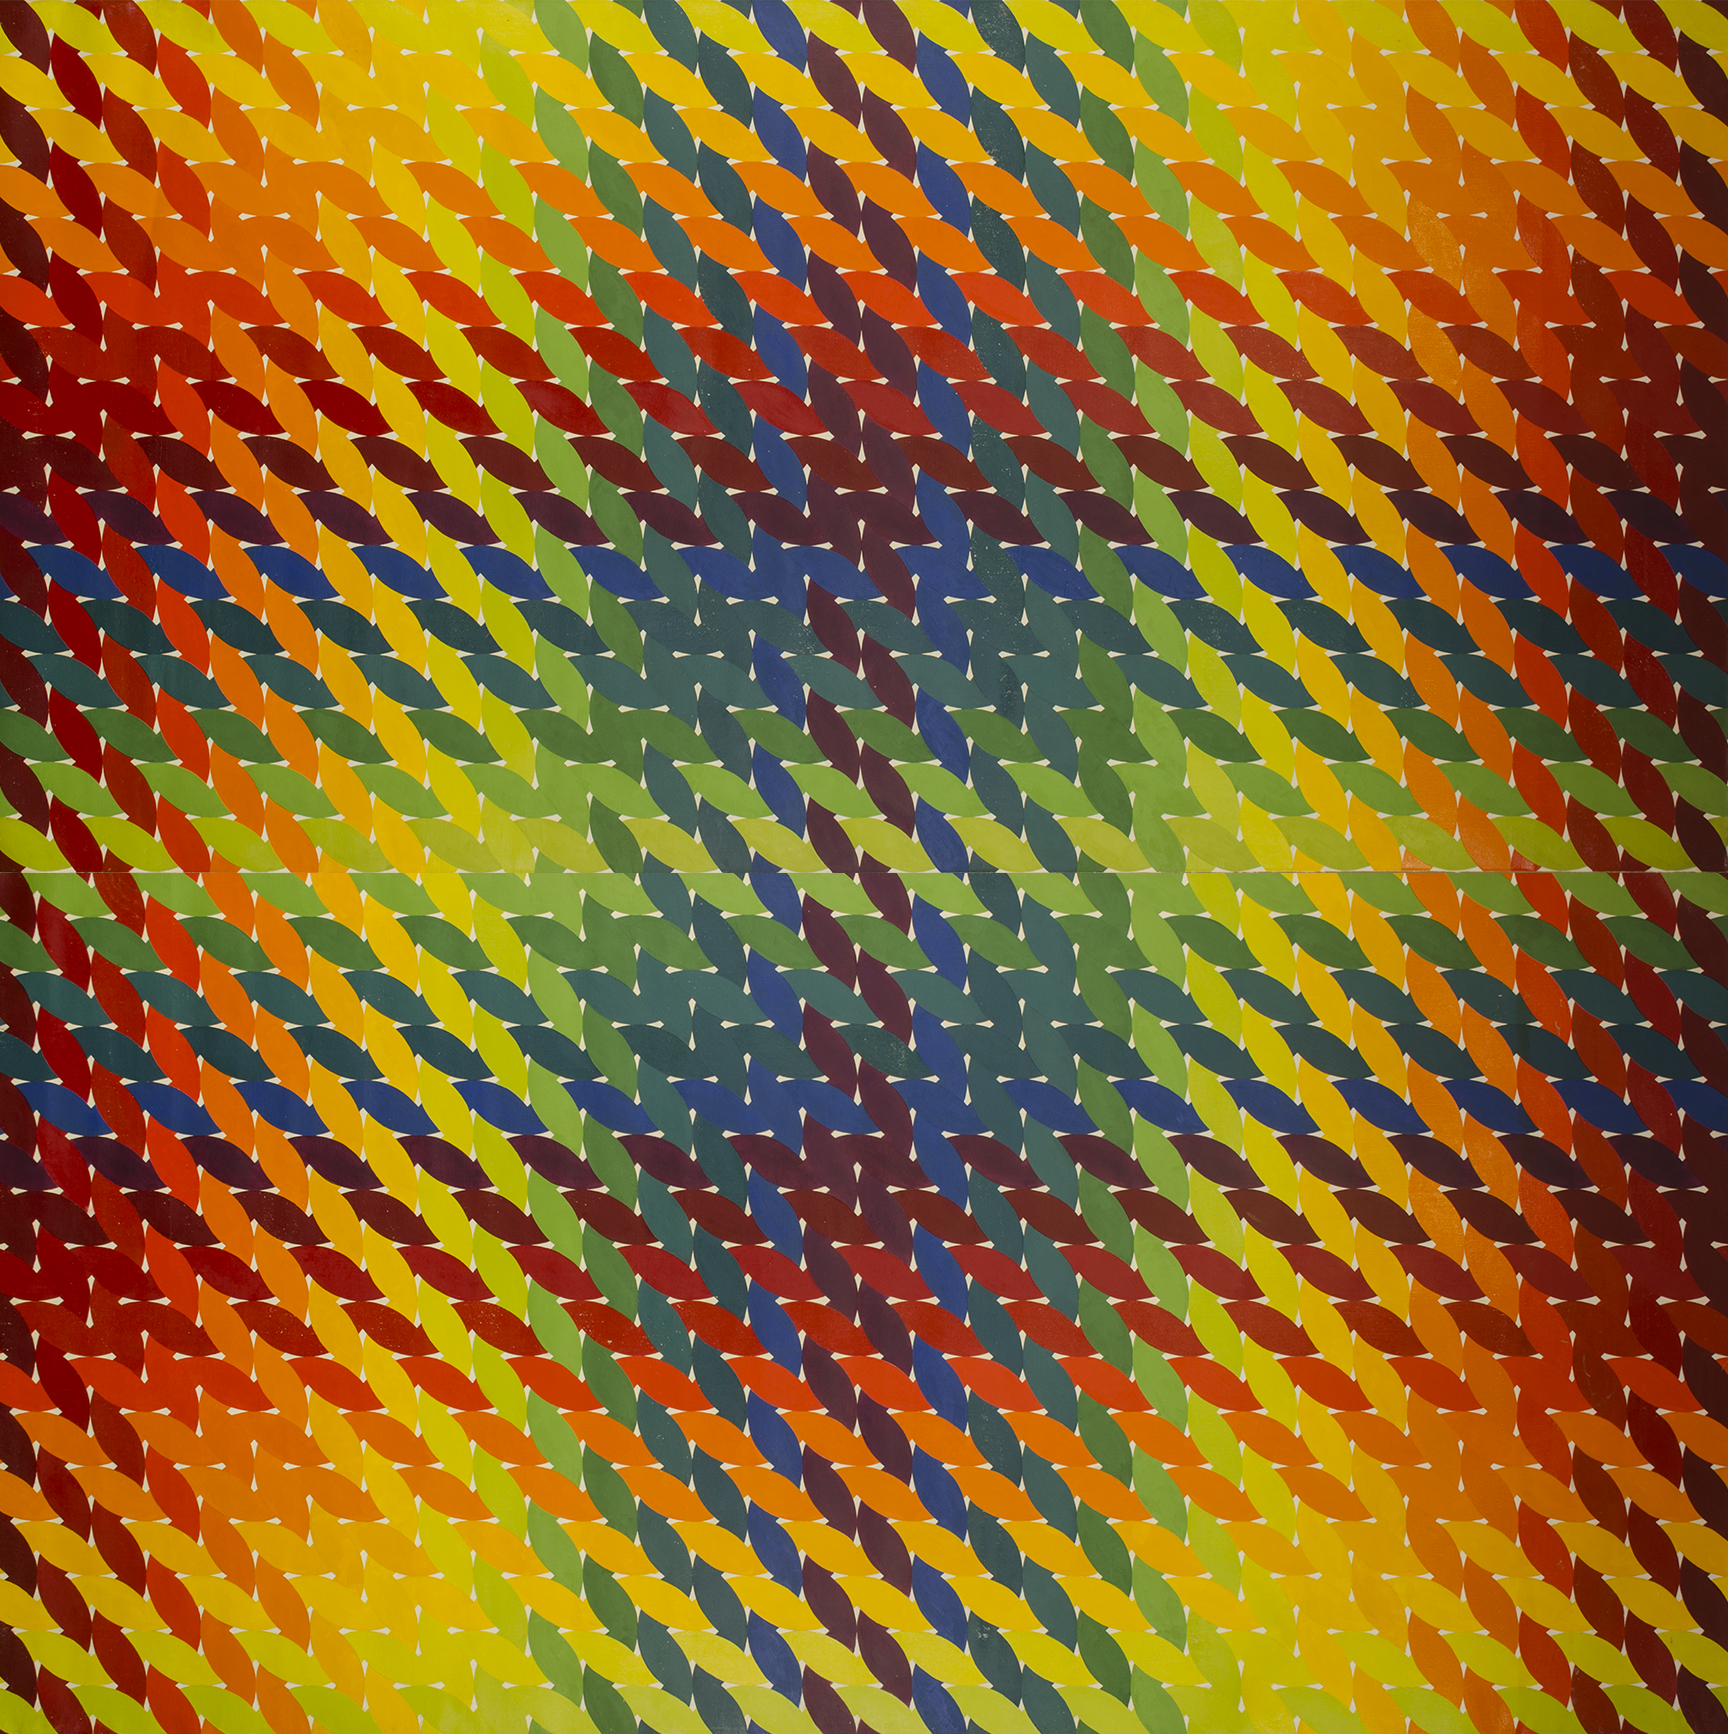 "WEAVE ROOM 1972-1975©- RIGHT SIDE PANEL 96"" X 96"" [243.84 CM X 243.84 CM]"